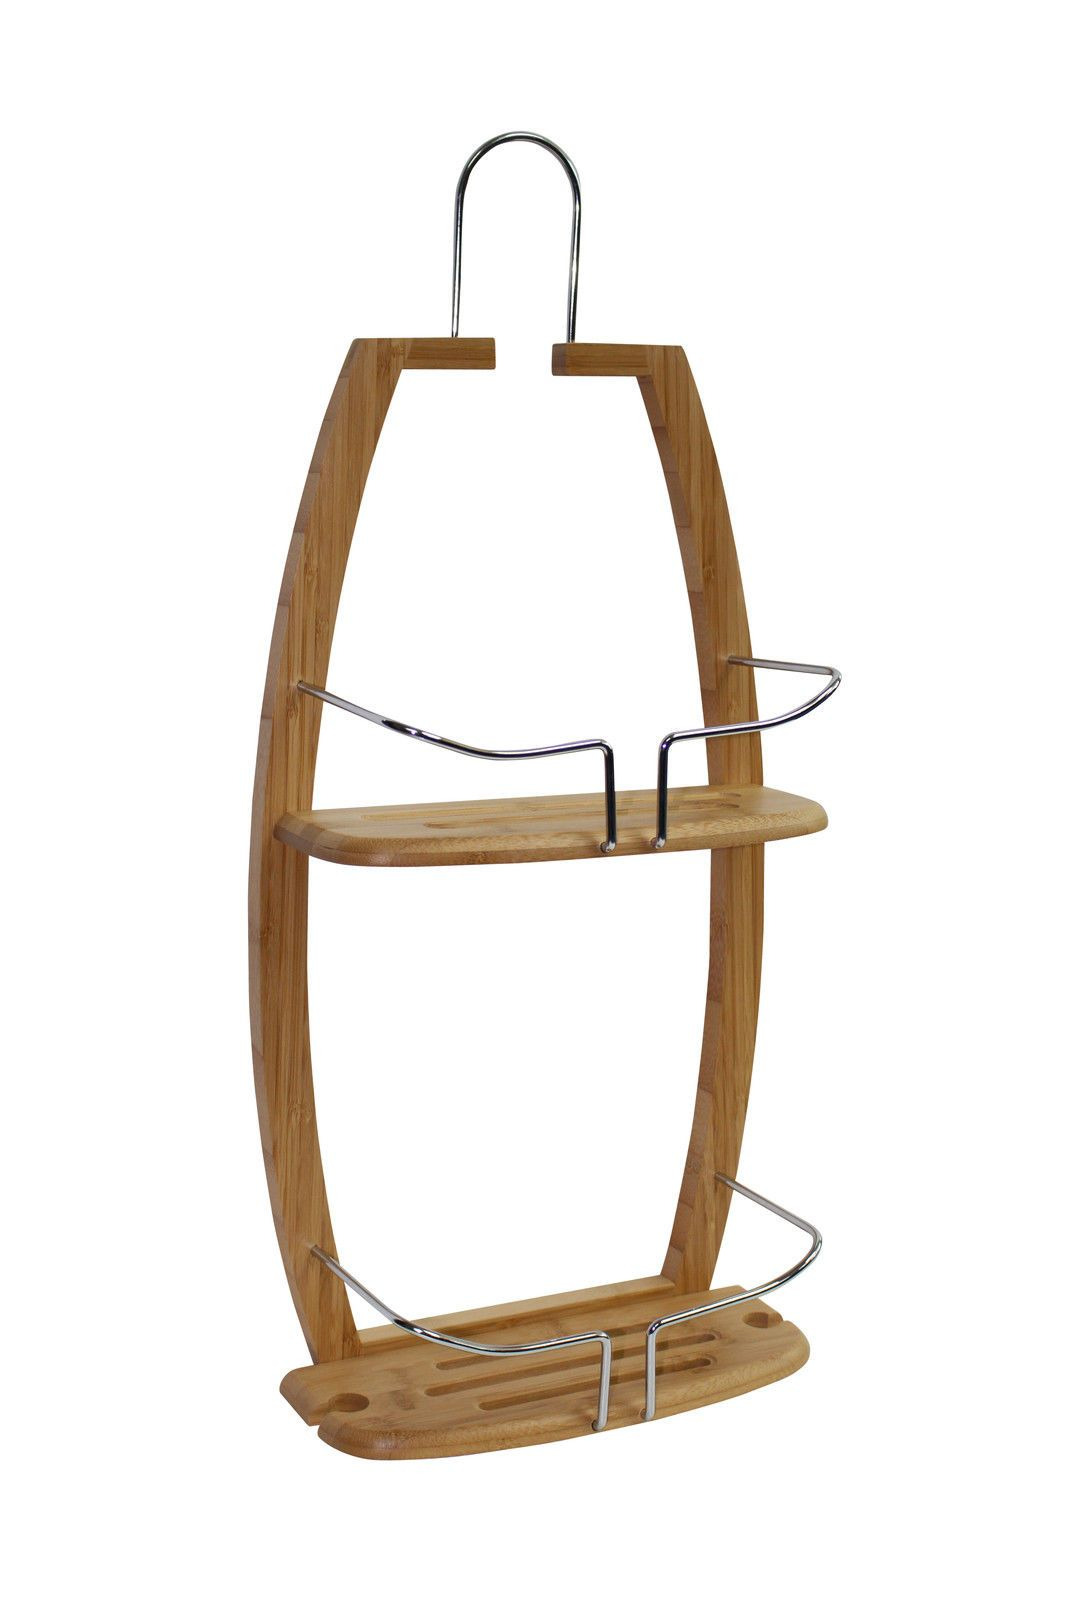 Bamboo 2 tier hanging shower #caddy #storage basket organiser ...